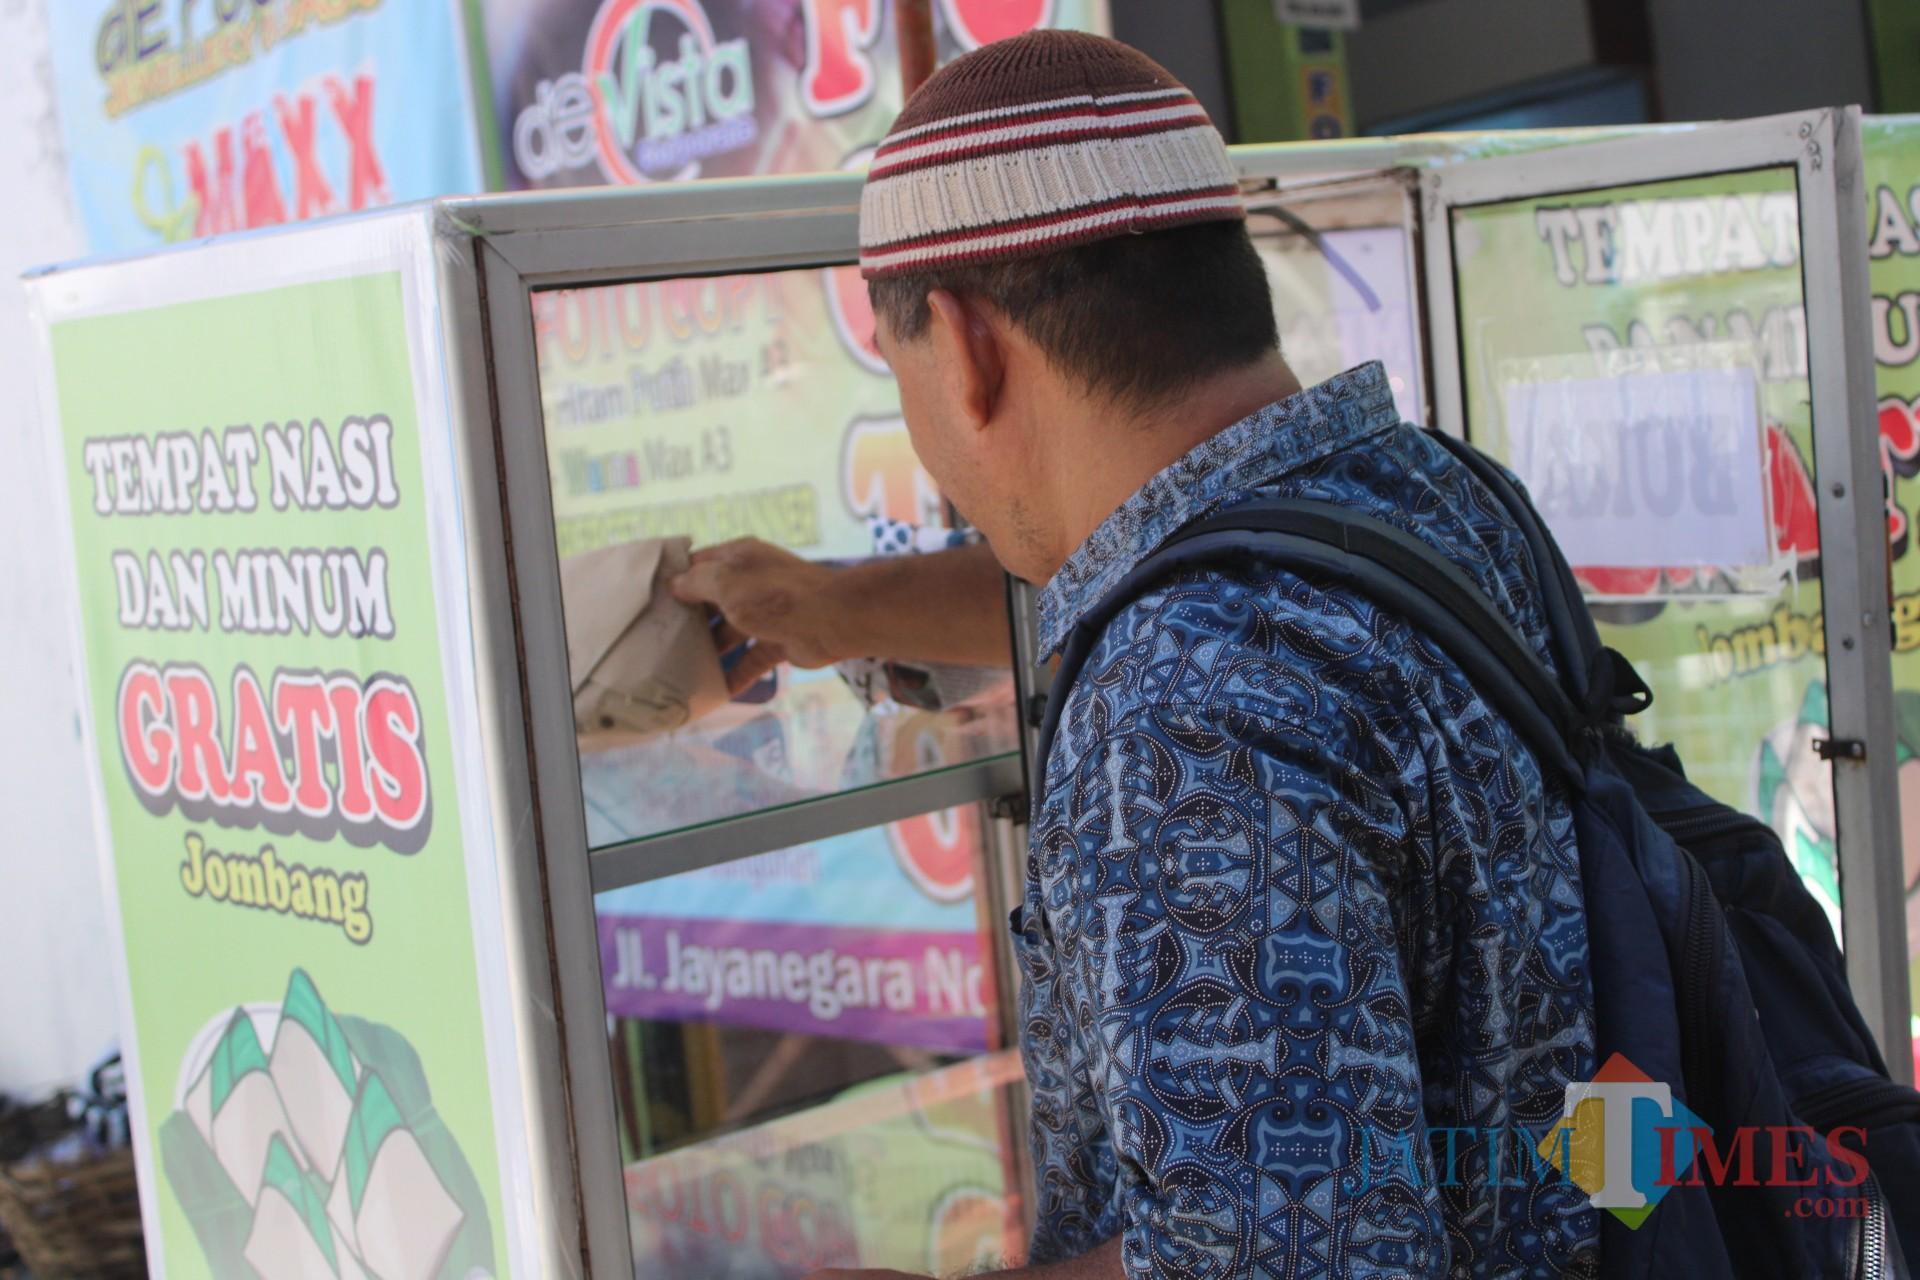 Salah satu warga yang melintasi Jl Jayanegara, Kelurahan Kepanjen, Kecamatan/Kabupaten Jombang, terlihat sedang mengambil makanan yang disediakan di gerobak tempat makanan dan minuman gratis. (Foto : Adi Rosul / JombangTIMES)